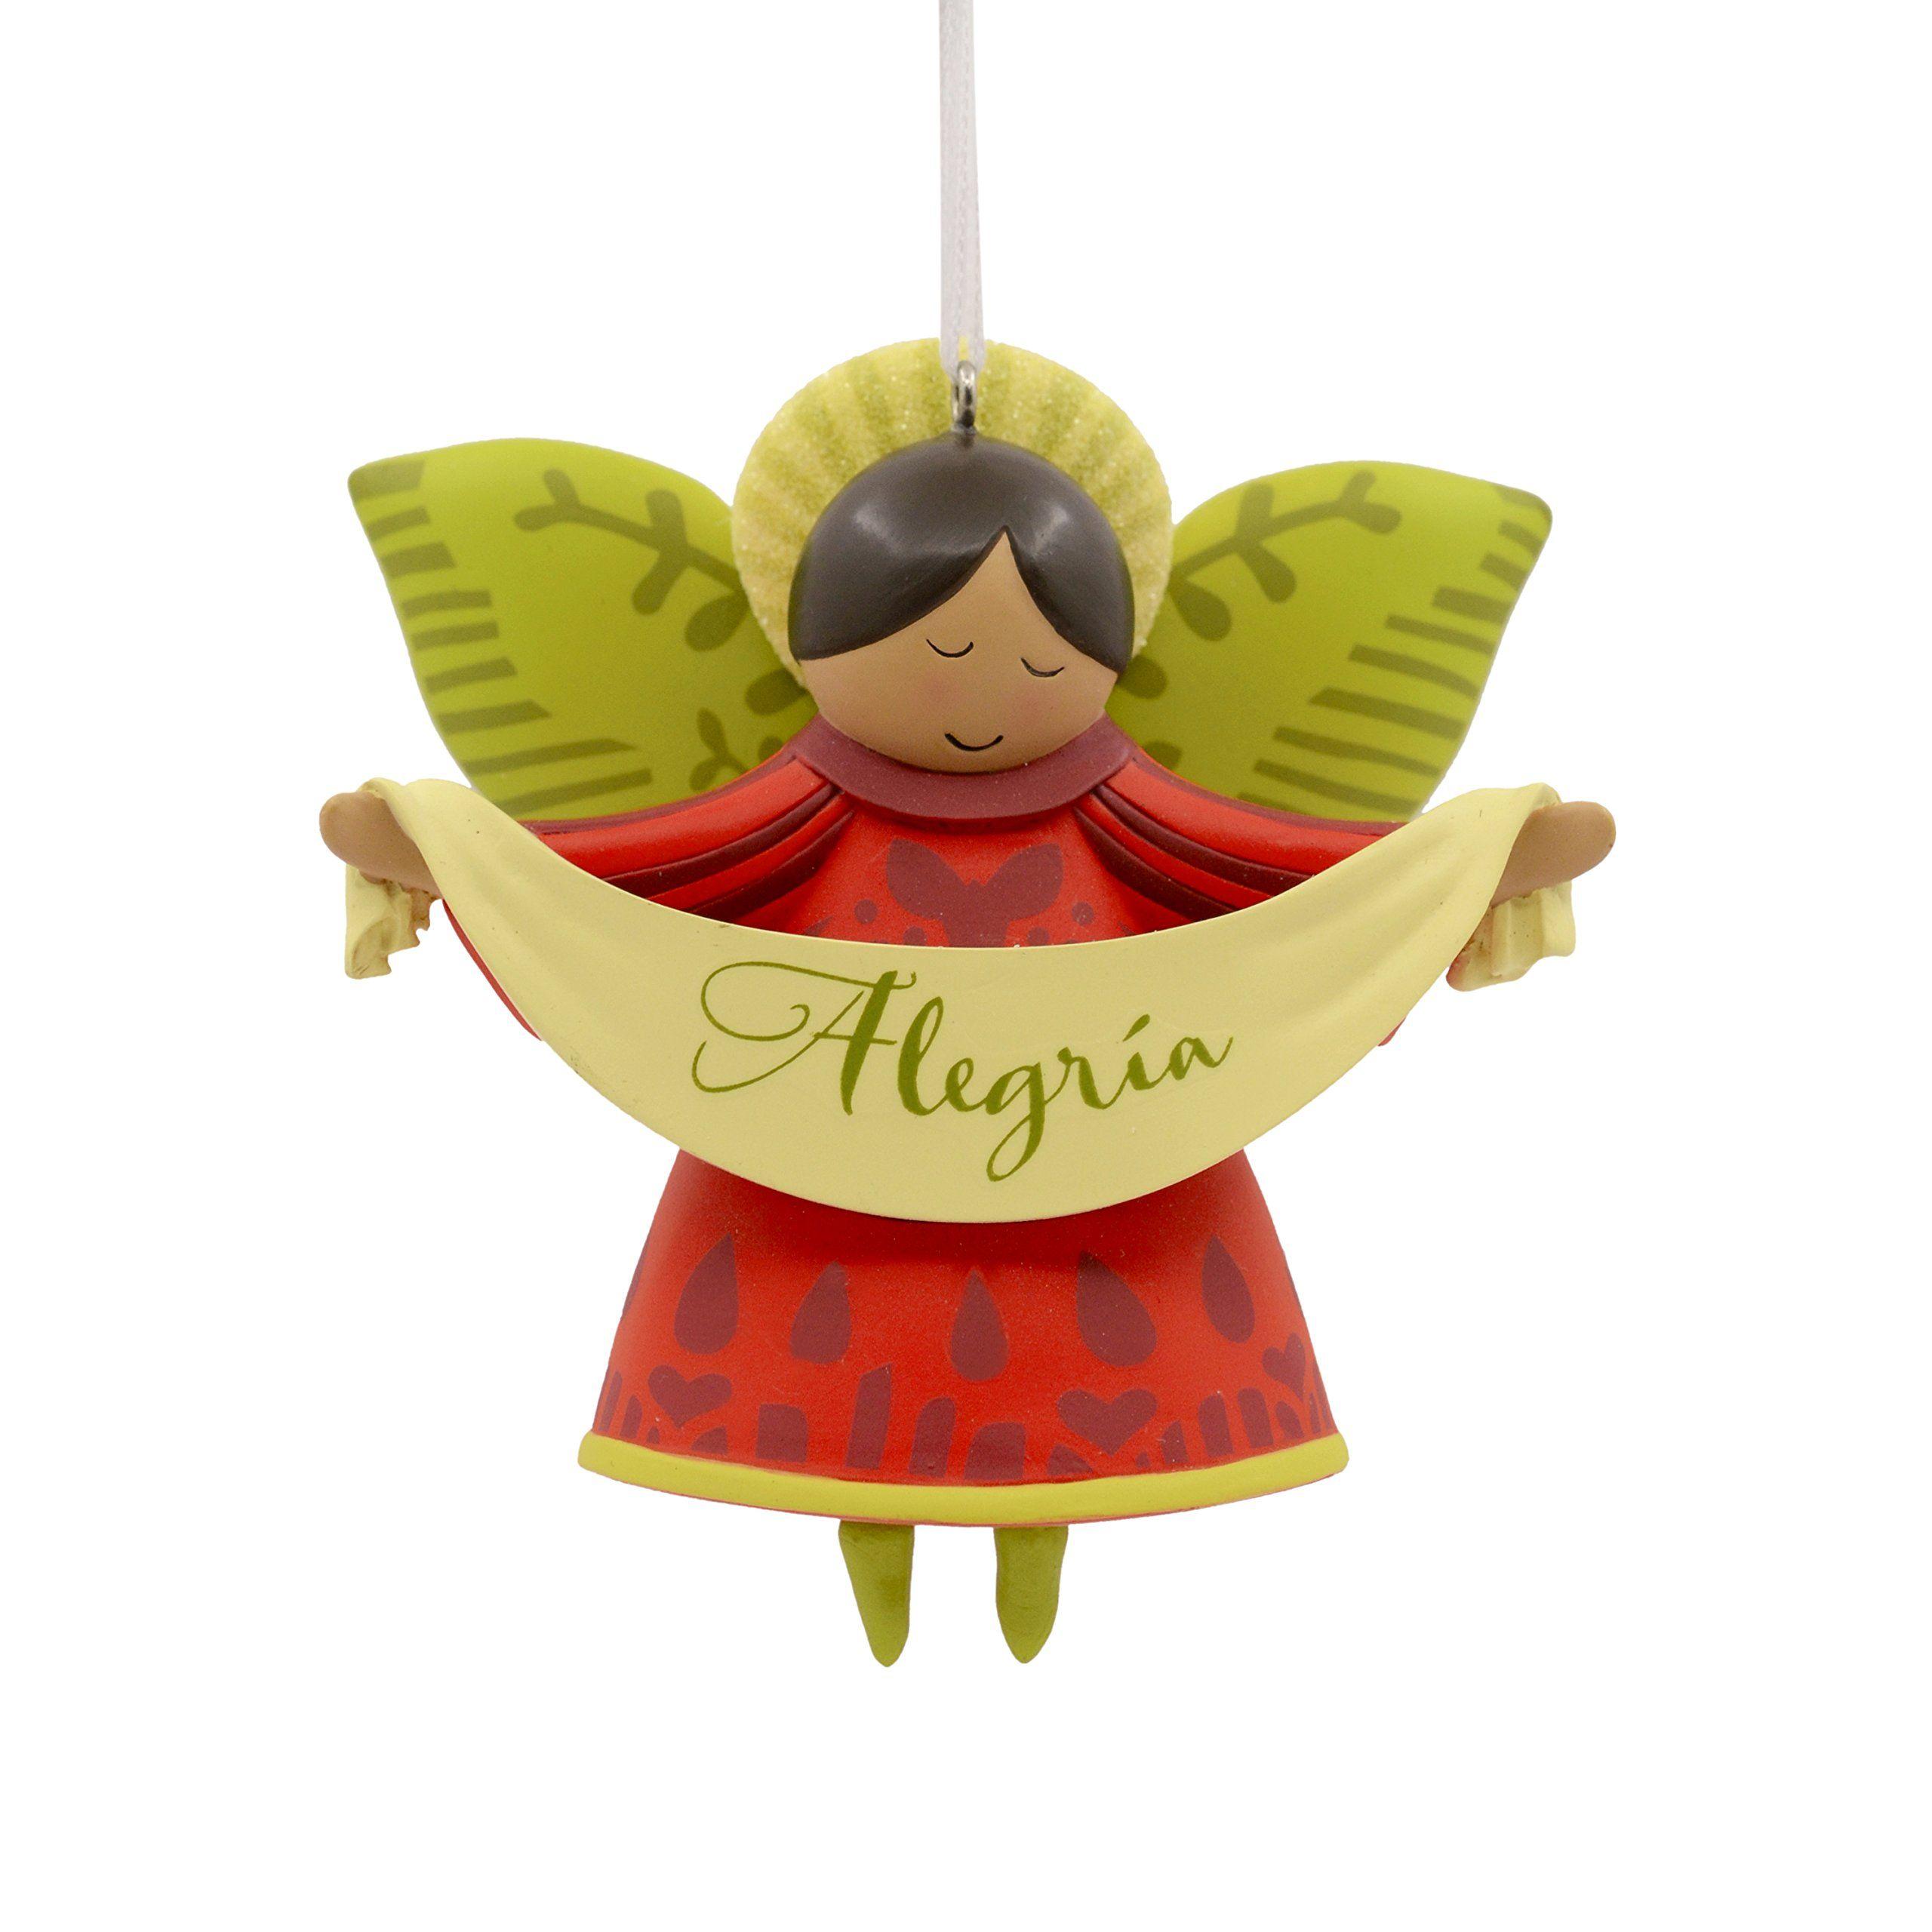 Hallmark Vida Christmas Ornament Alegria Angel Spanish Language See This Great Product Note Amazon Affiliate Link Christmas Ornaments Ornaments Hallmark